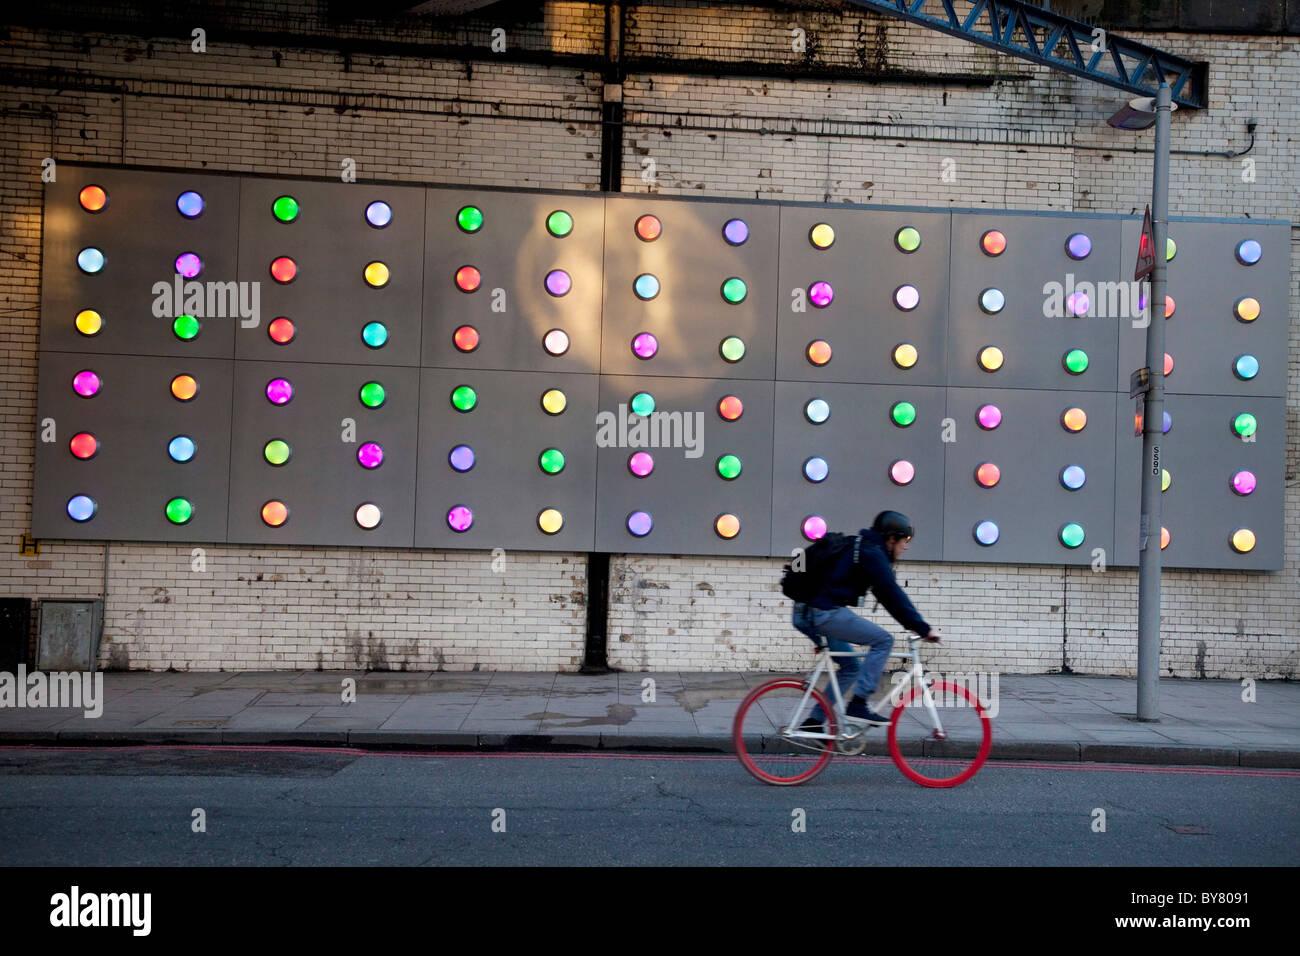 Large Scale Art Large Scale Art Stock Photos Large Scale Art Stock Images Alamy